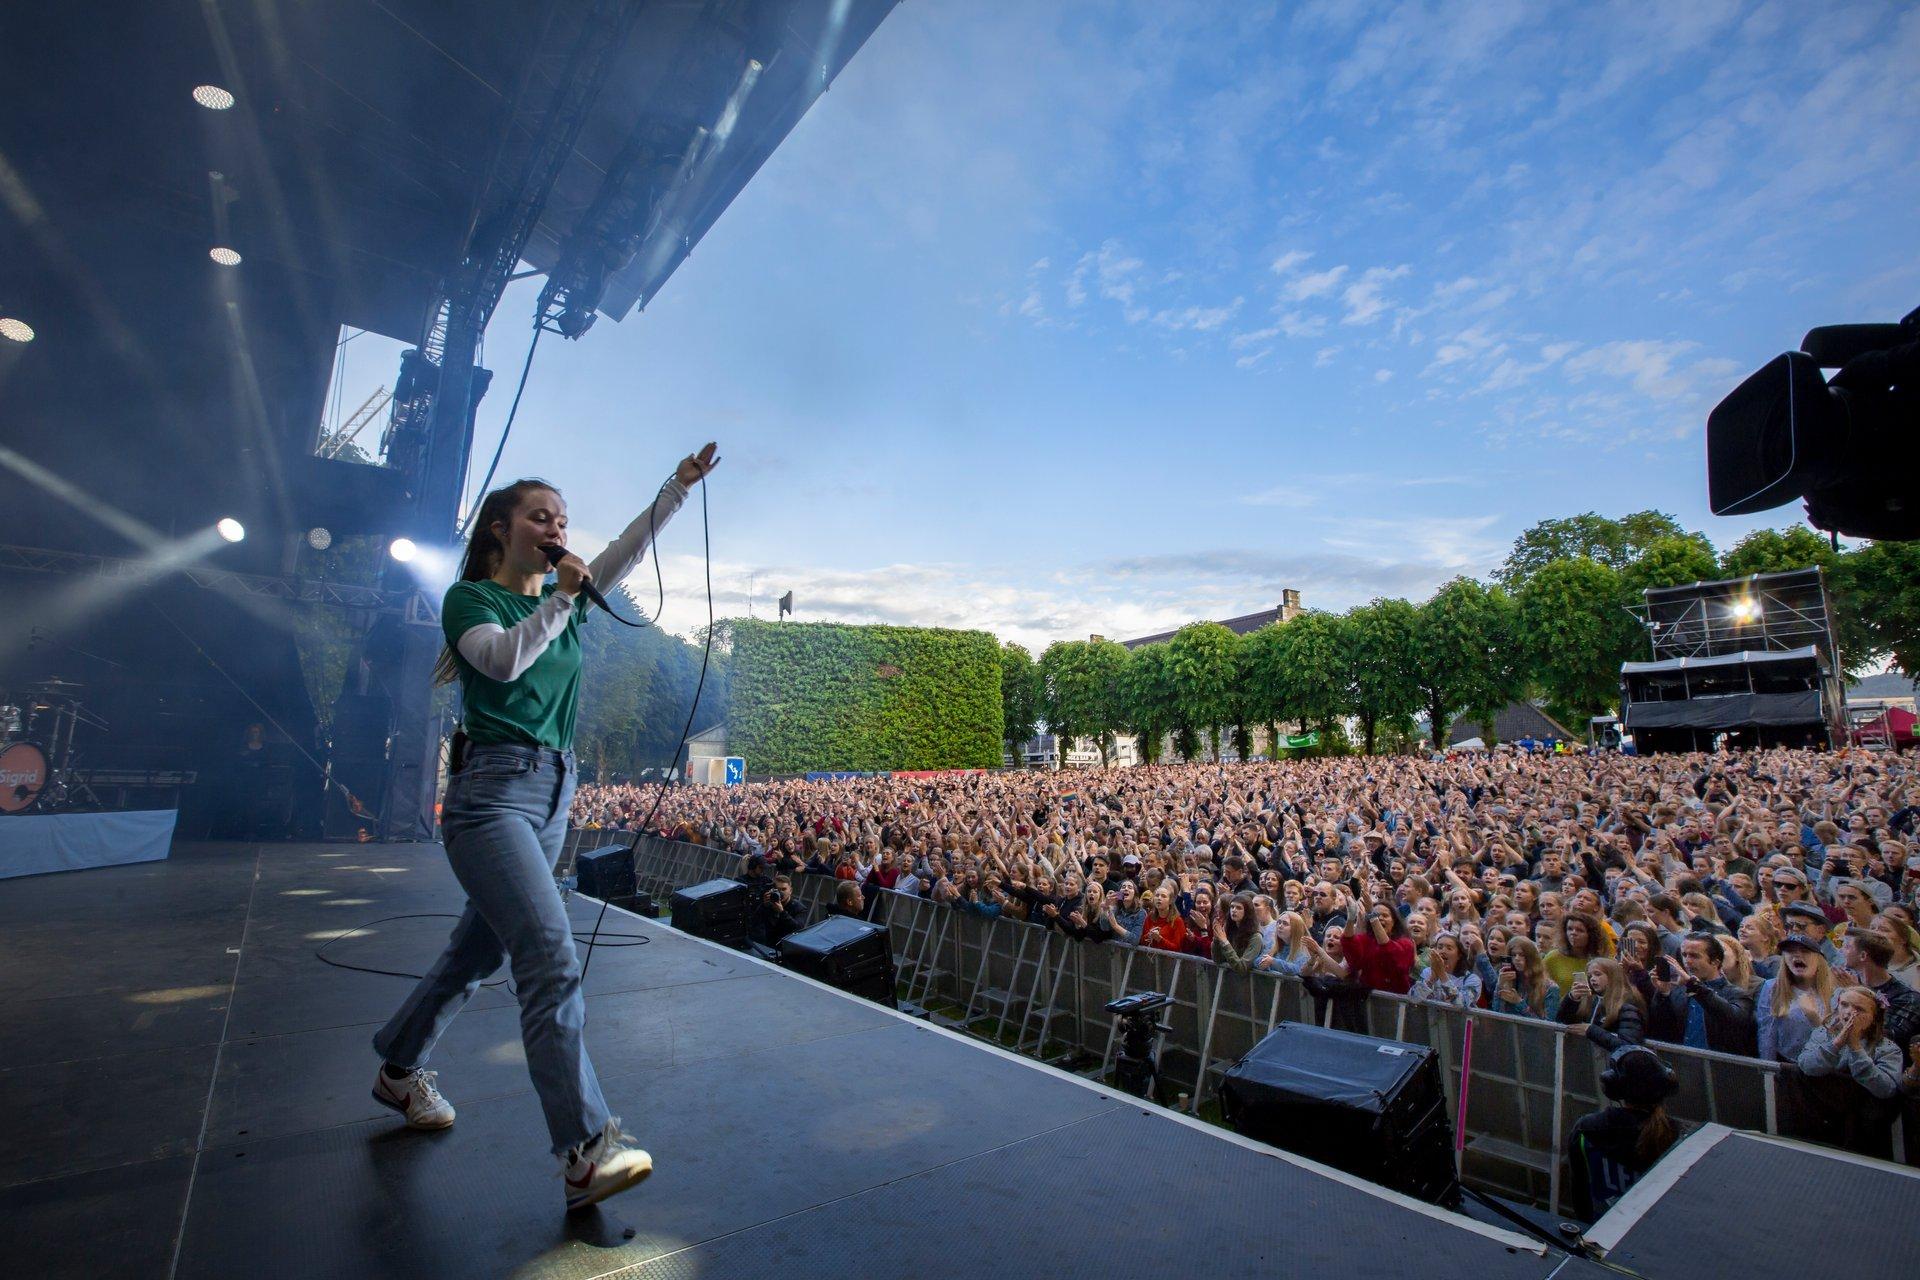 Sigrid performing in the Bergenhus 2020